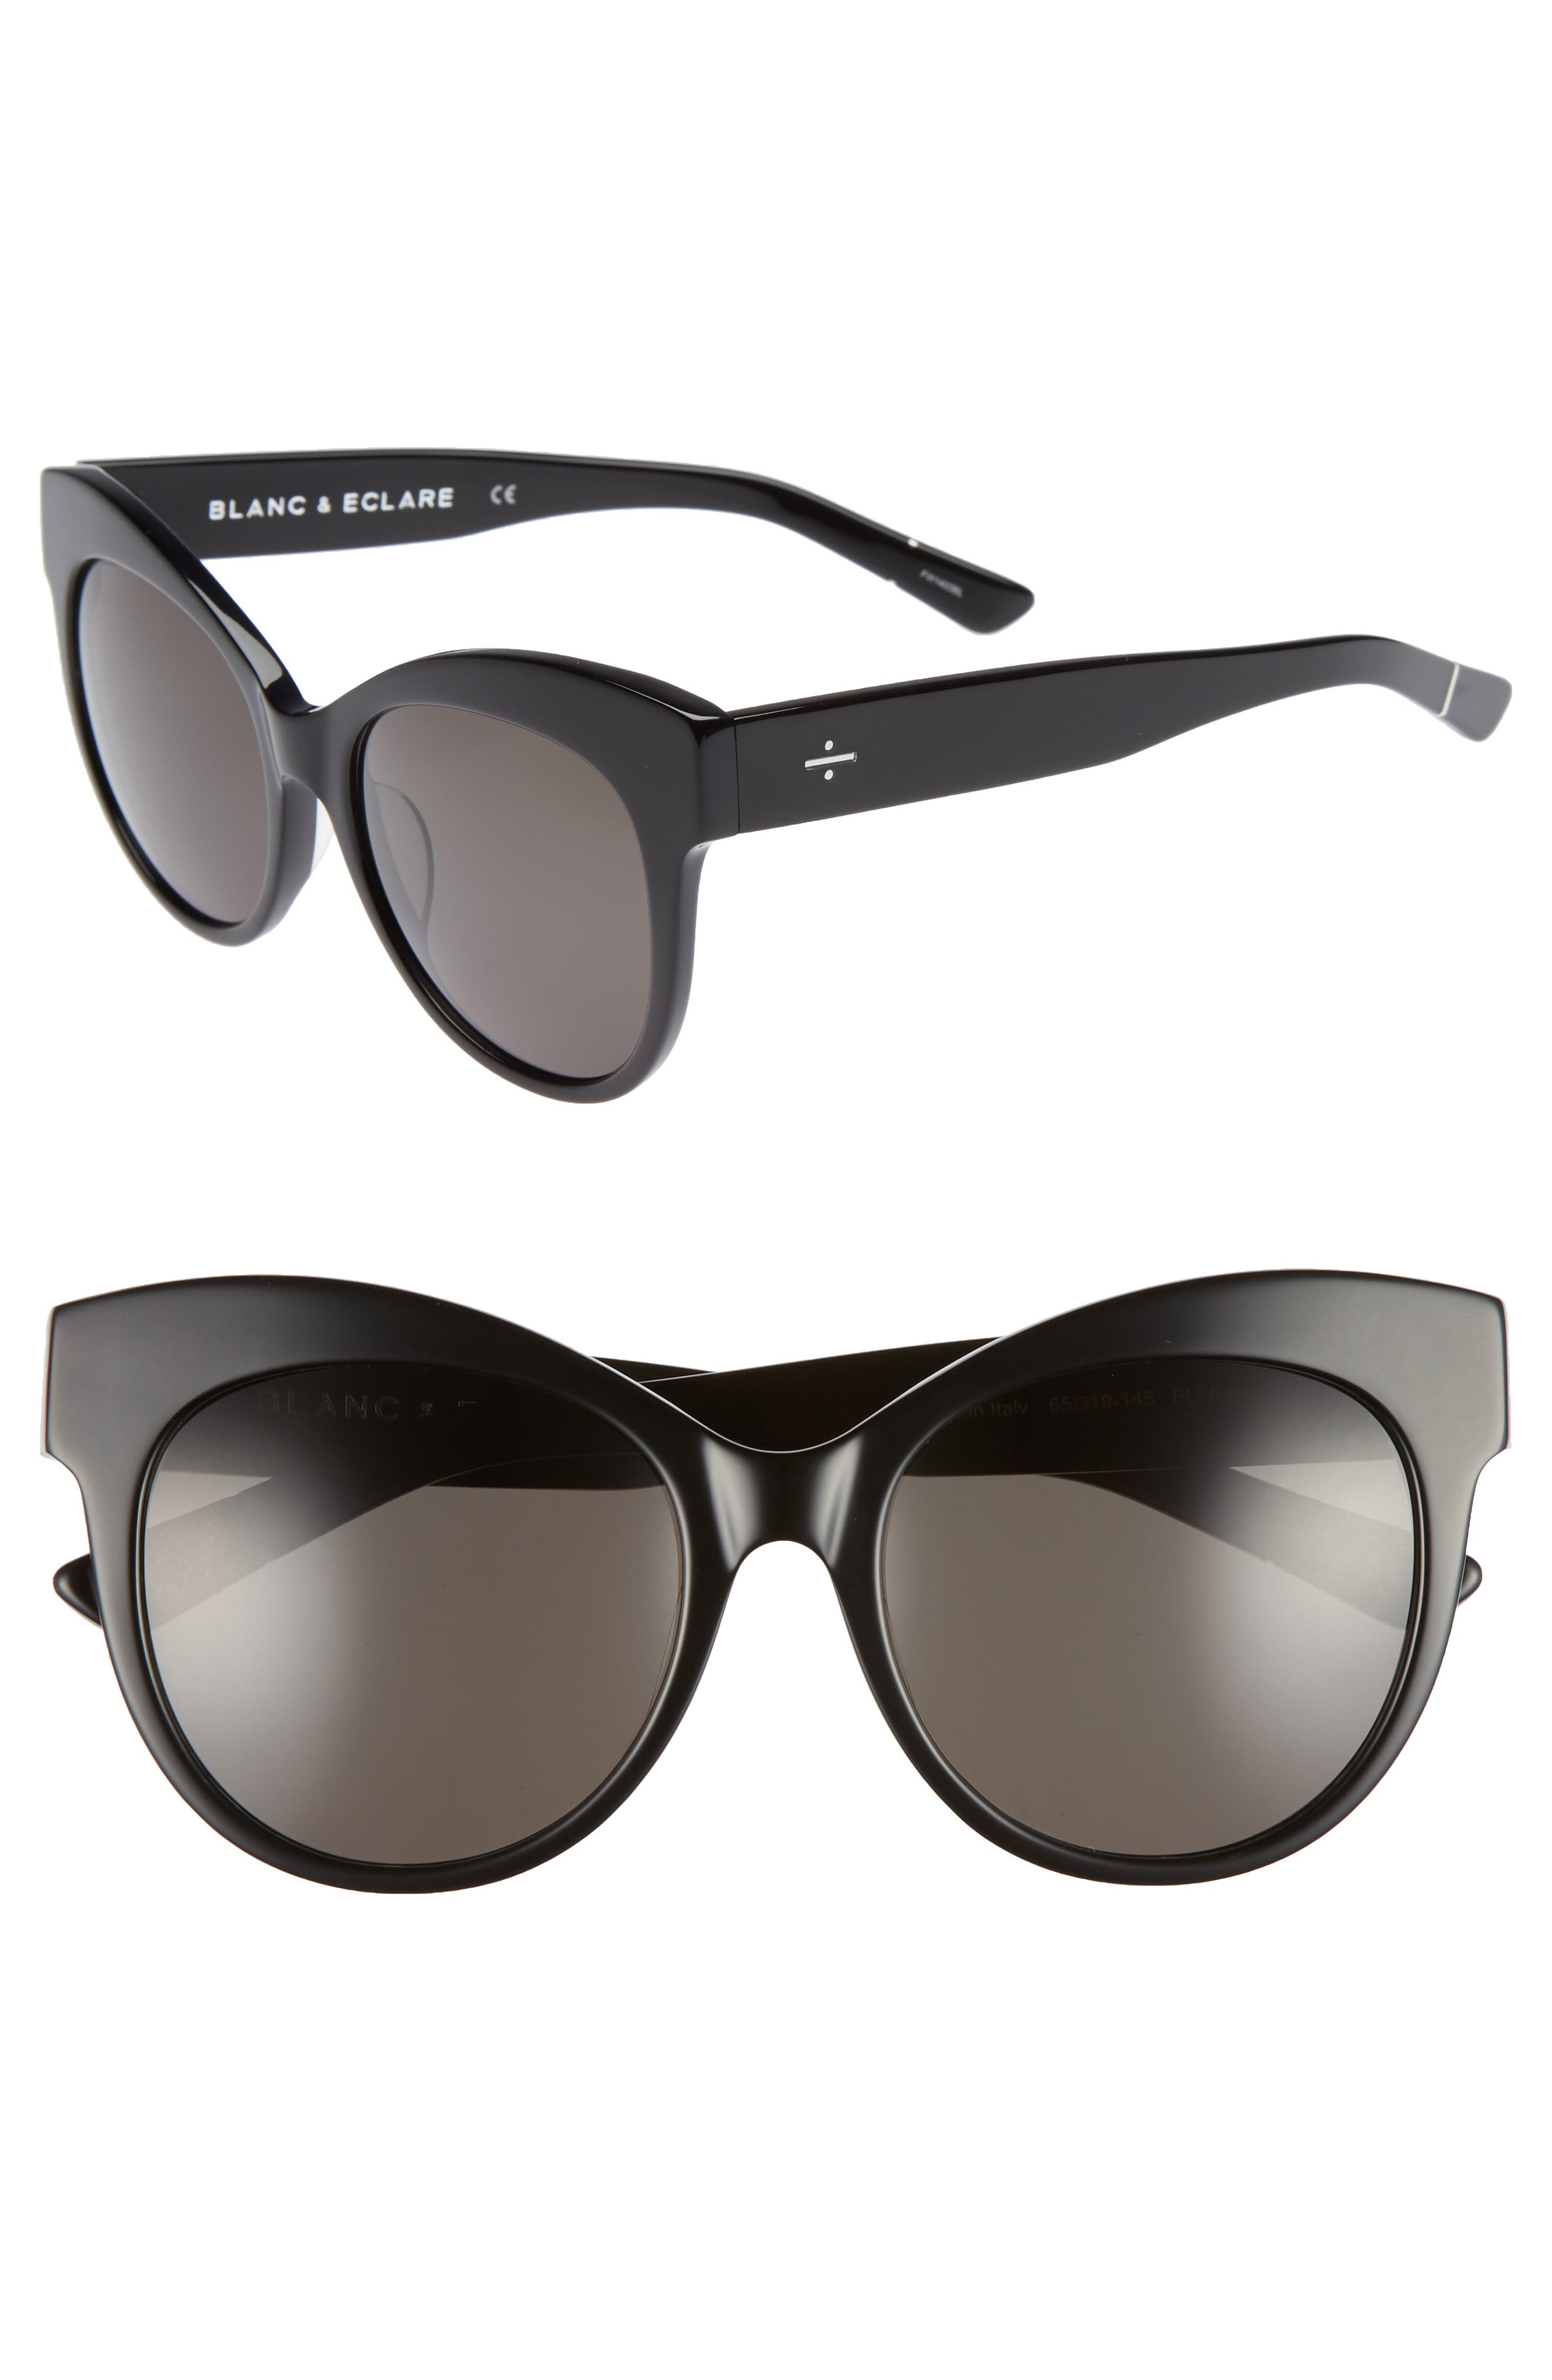 BLANC & ECLARE Paris 55mm Polarized Cat Eye Sunglasses,                         Main,                         color, 001